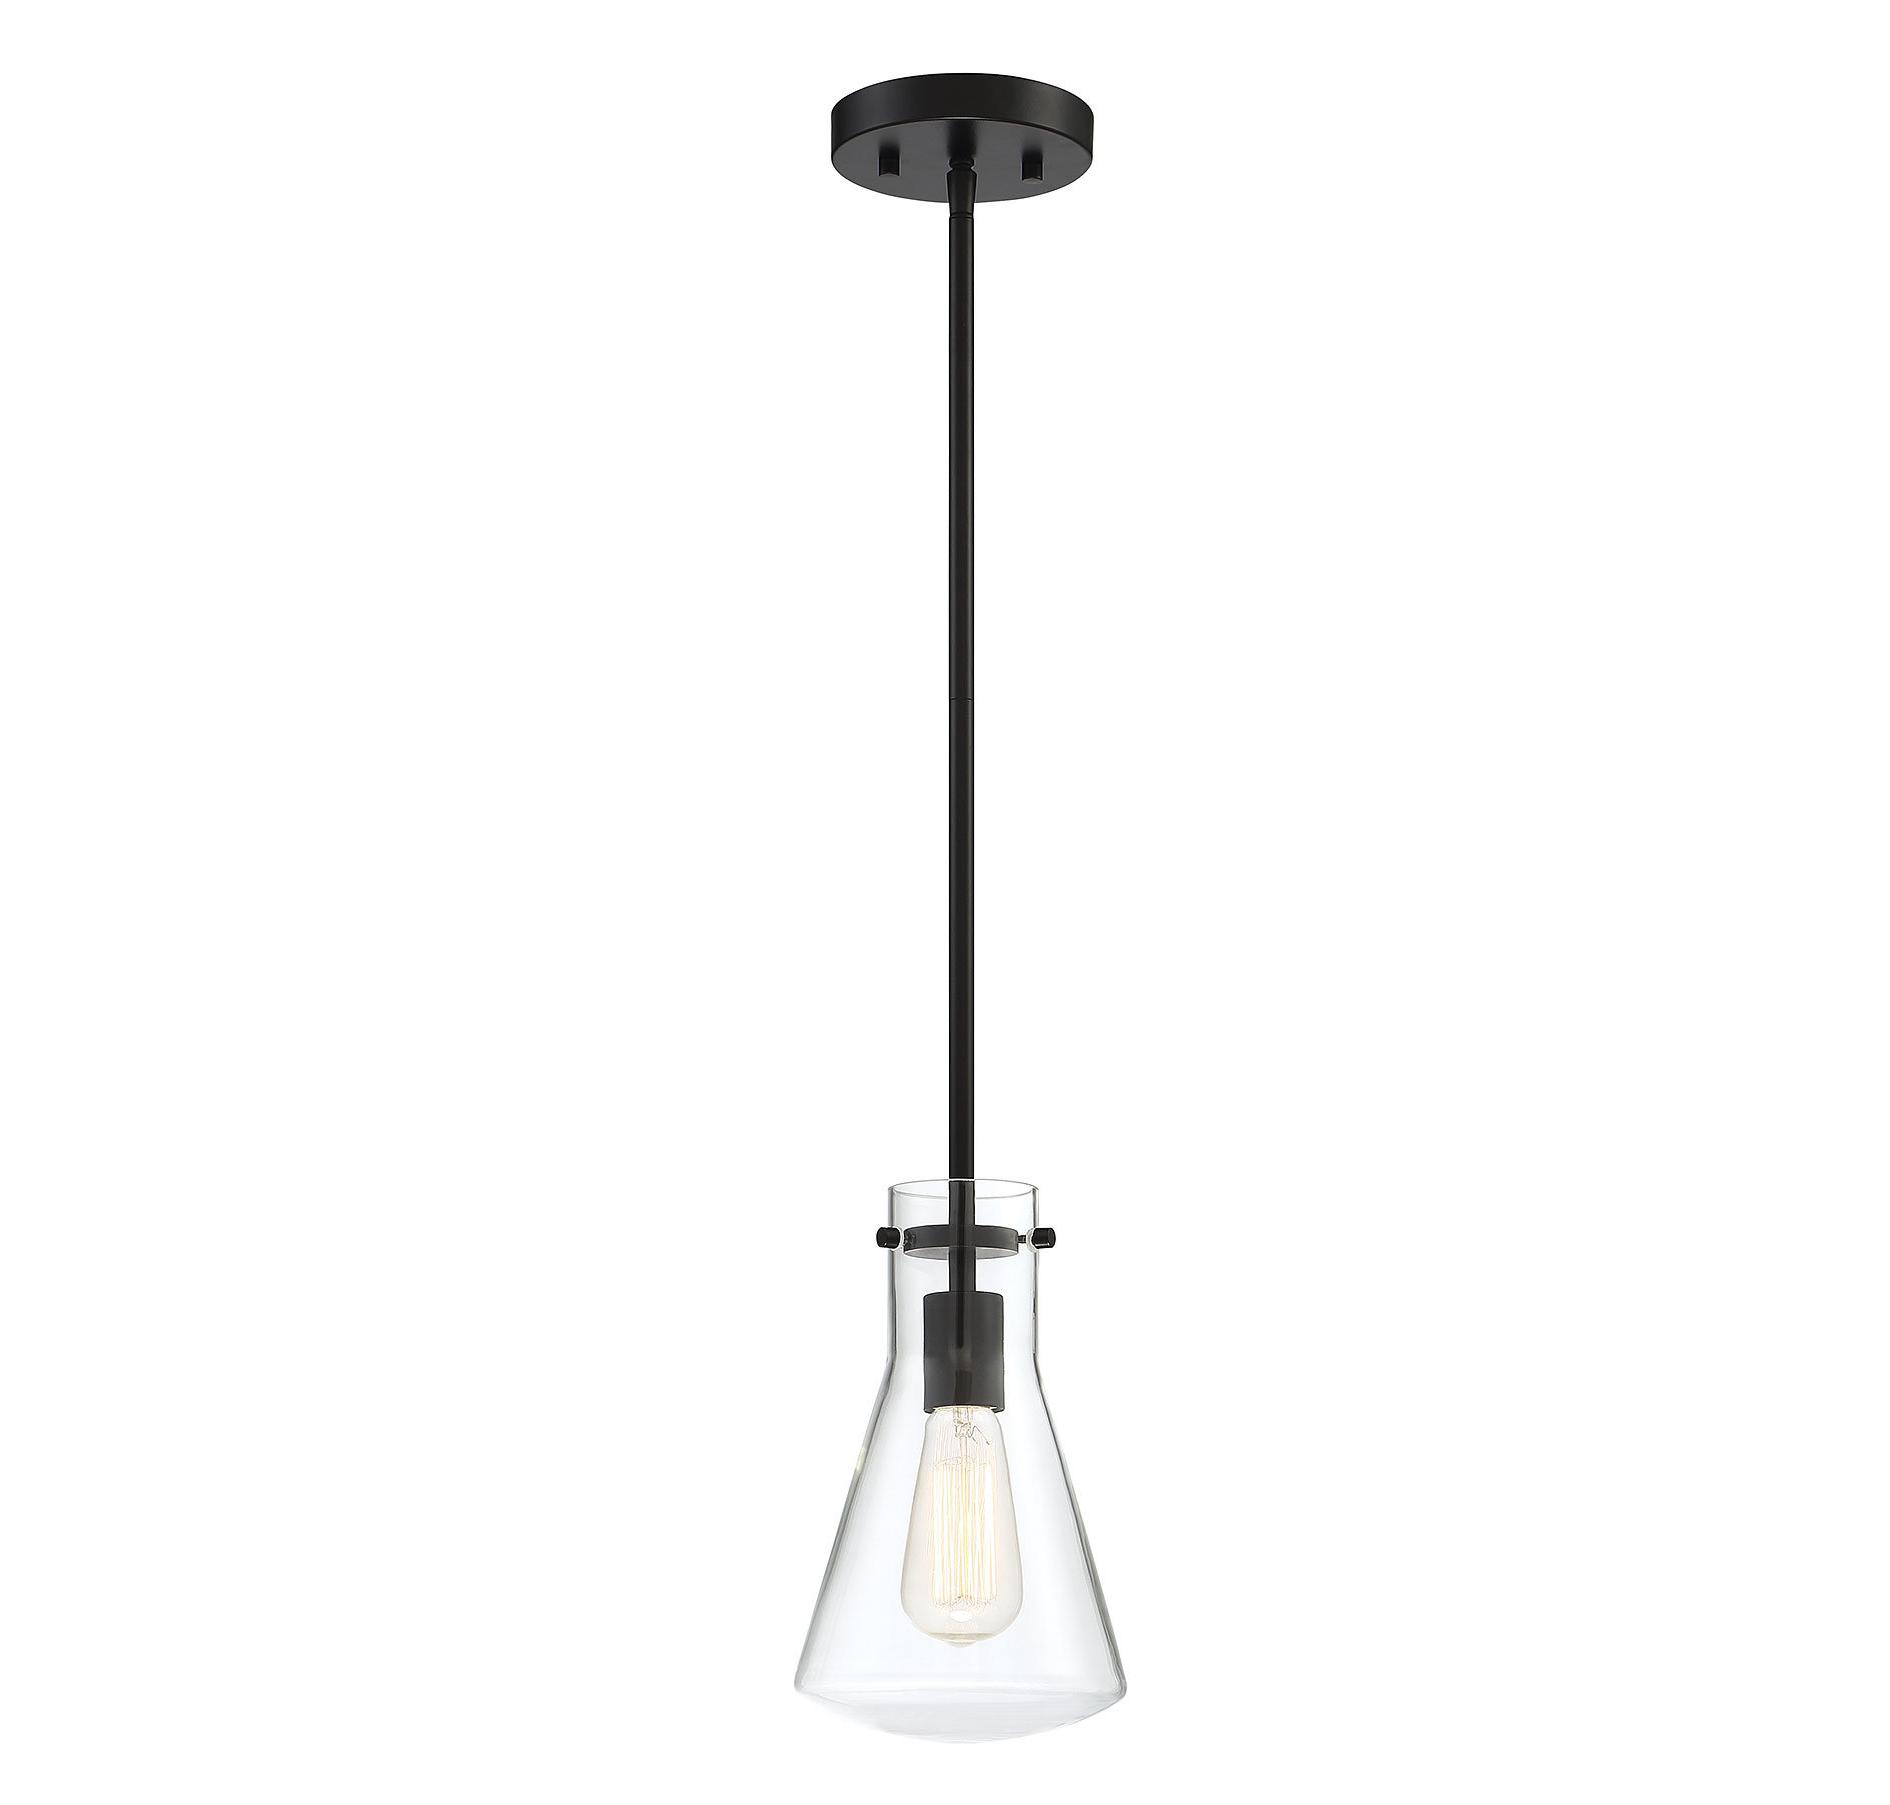 Houon 1 Light Cone Bell Pendants In 2020 Enciso 1 Light Single Cone Pendant (Gallery 23 of 25)